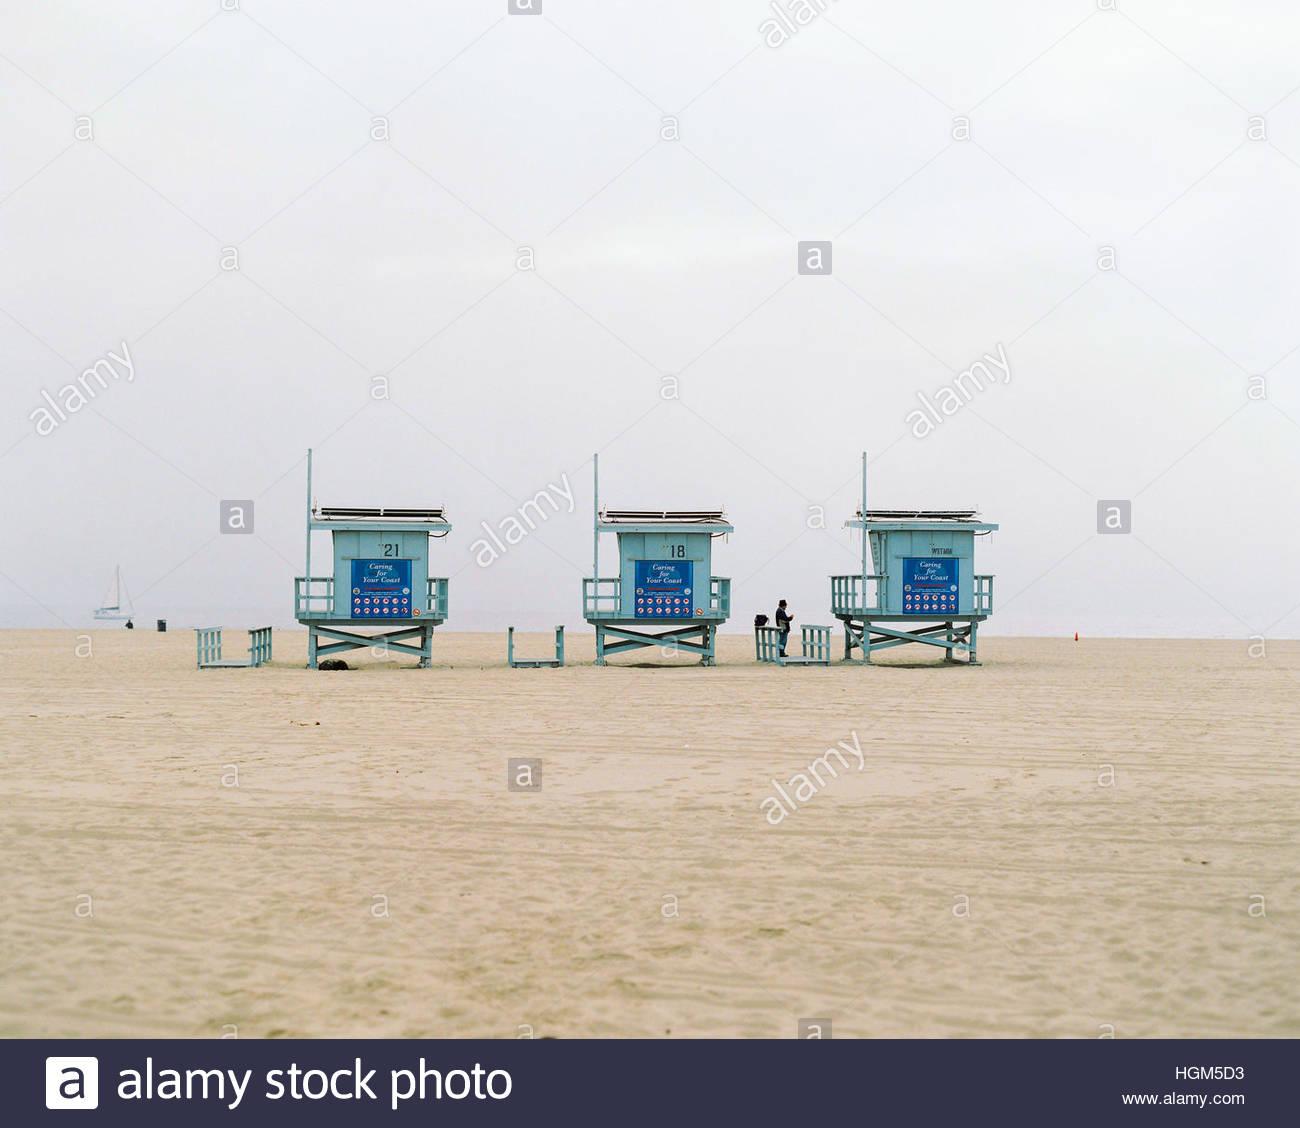 Los Angeles, Venice Beach, California, United States Stock Photo